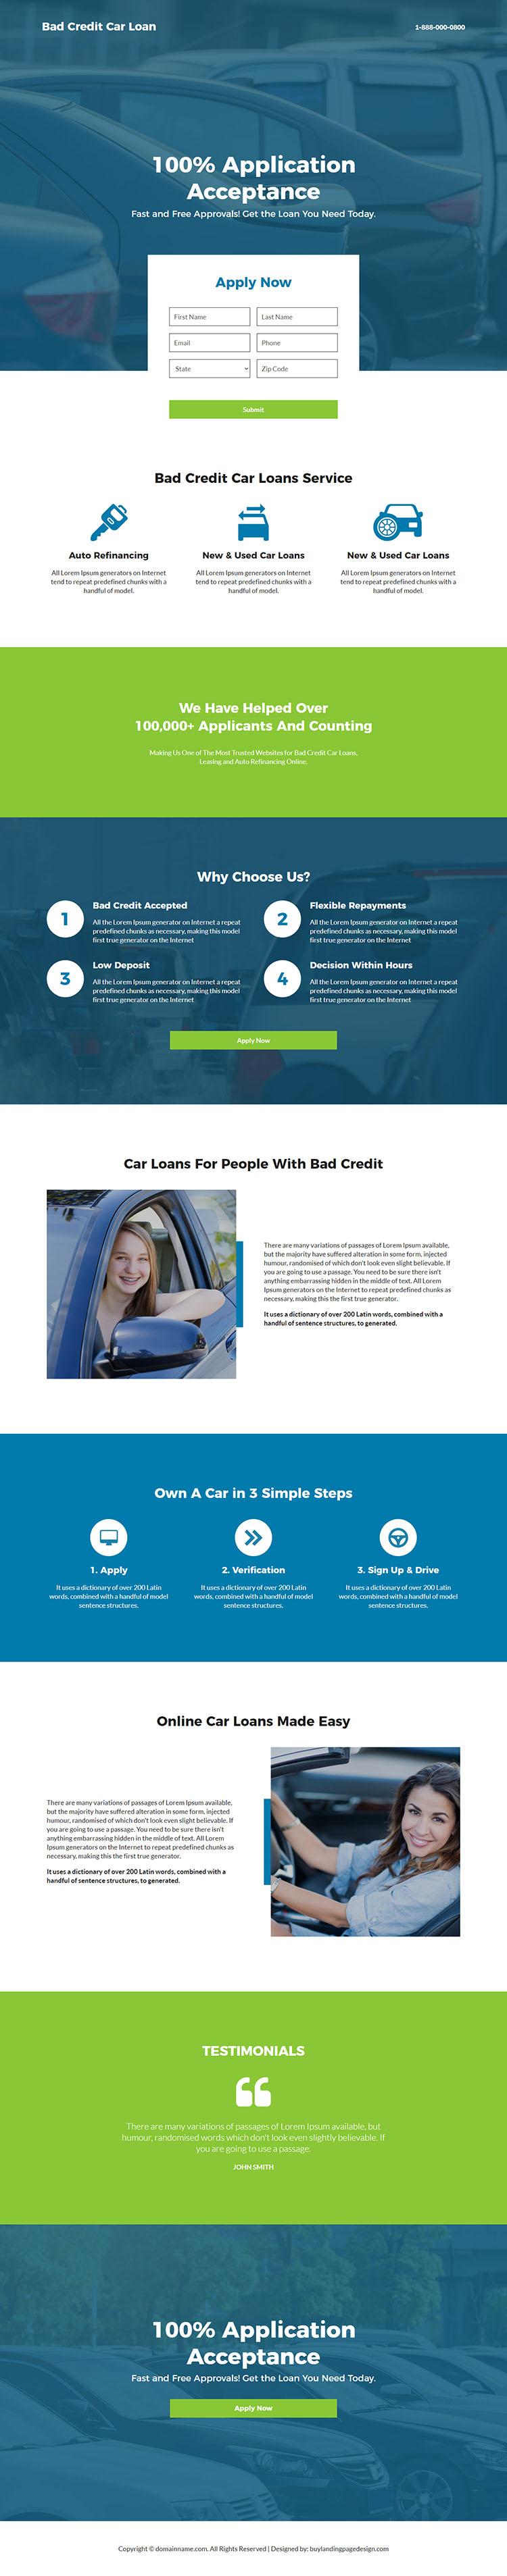 bad credit car loan service responsive landing page